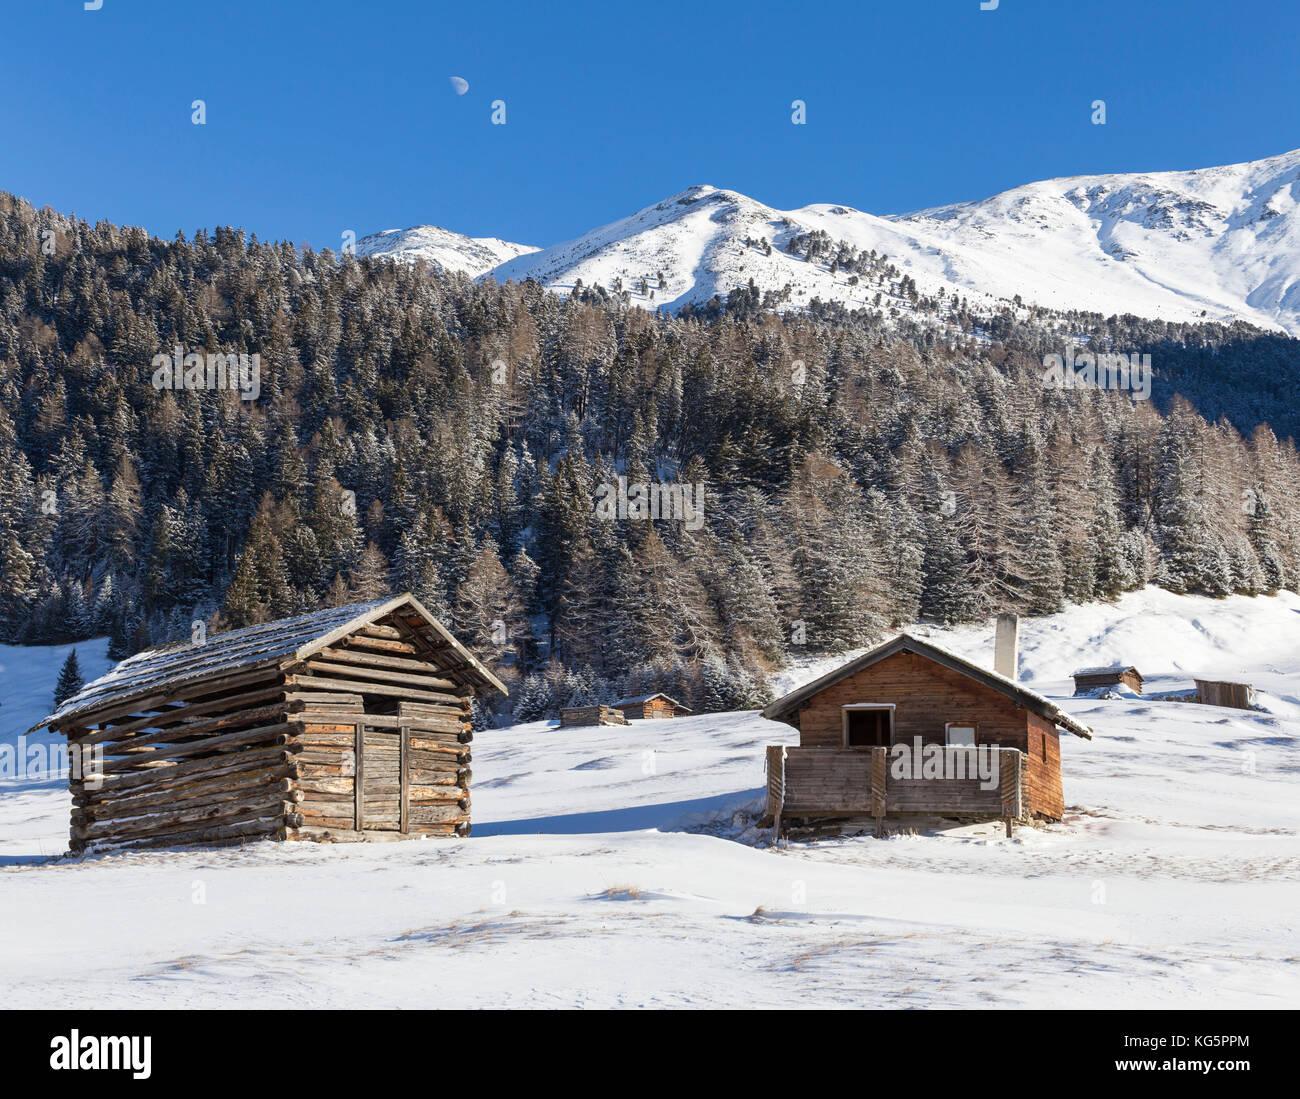 Pfunds Tschey, Pfunds, Inntal, Tirol, Osterreich, Europe - Stock Image